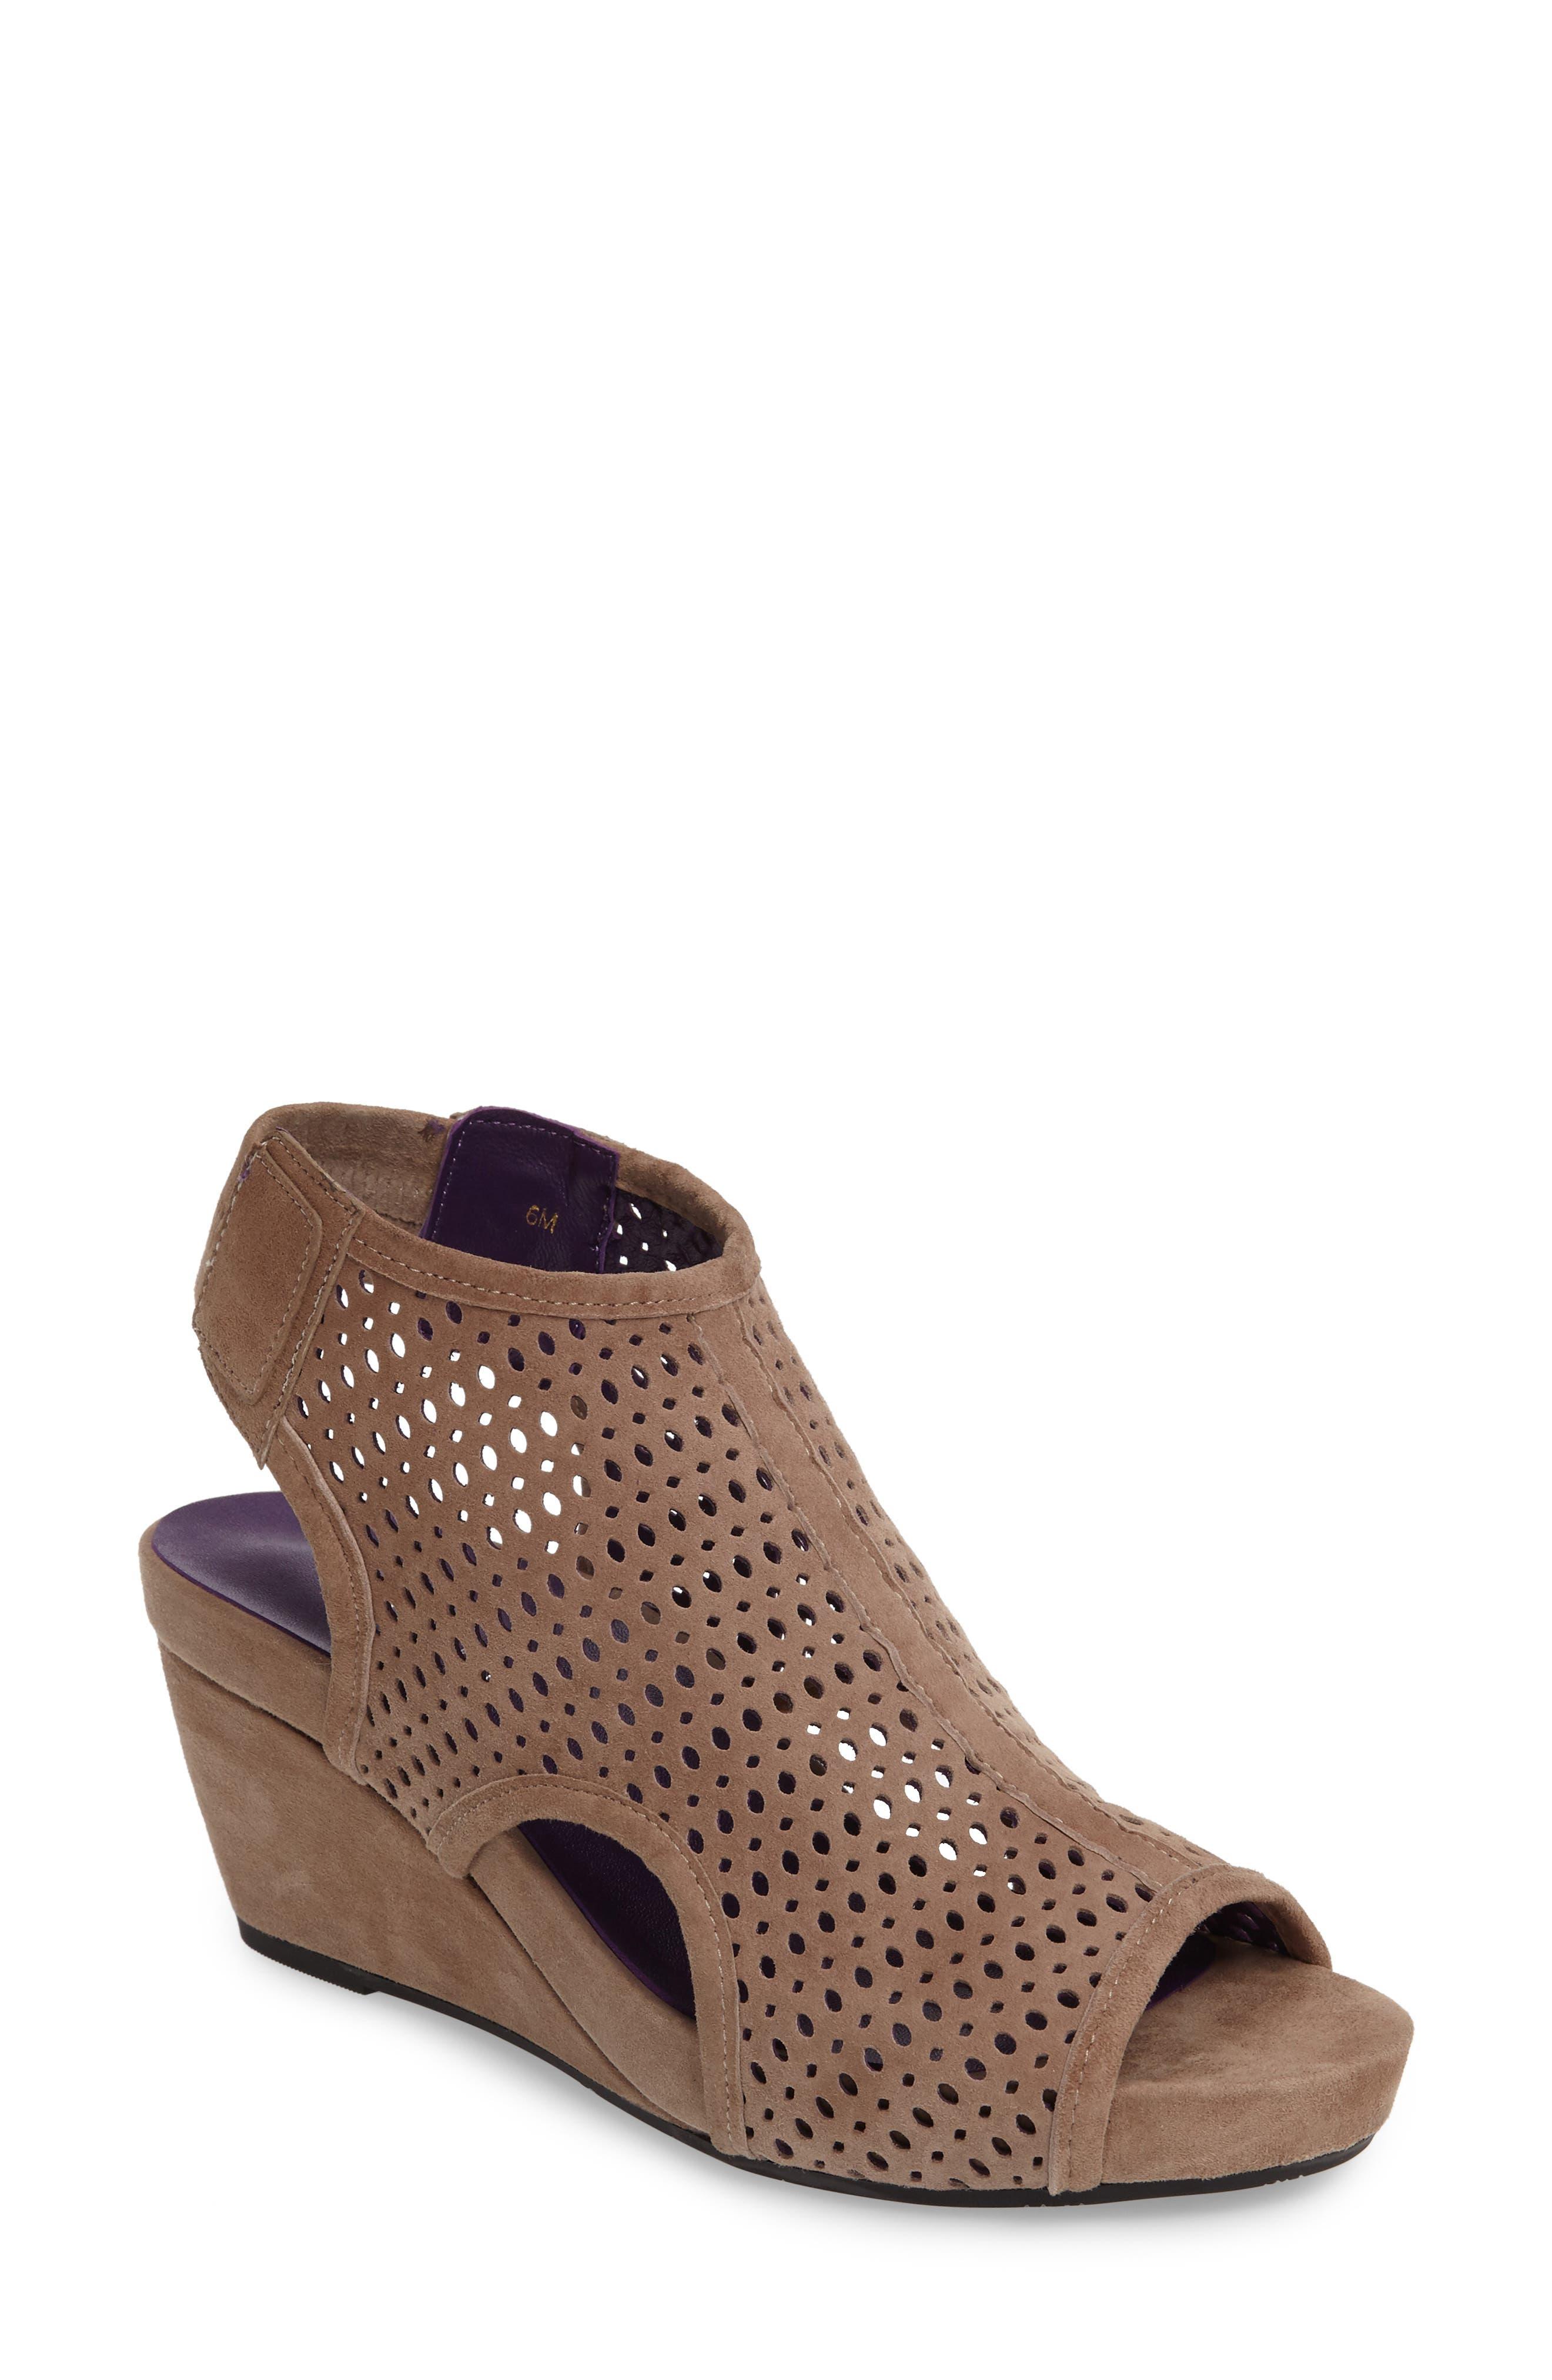 'Inez' Wedge Sandal,                         Main,                         color, Truffle Suede